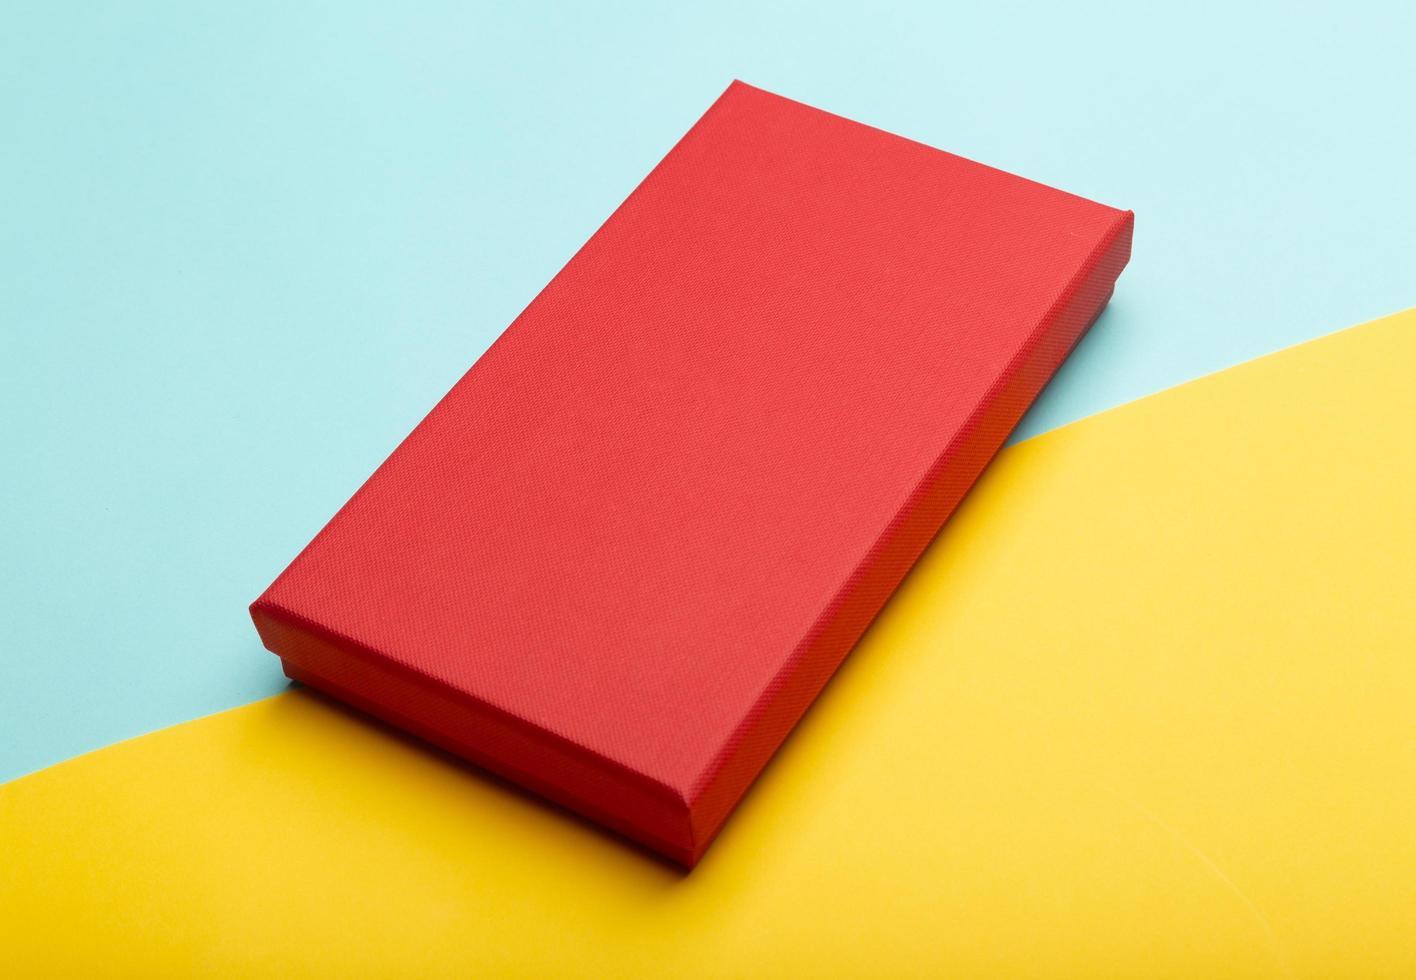 rote Produktverpackung foto